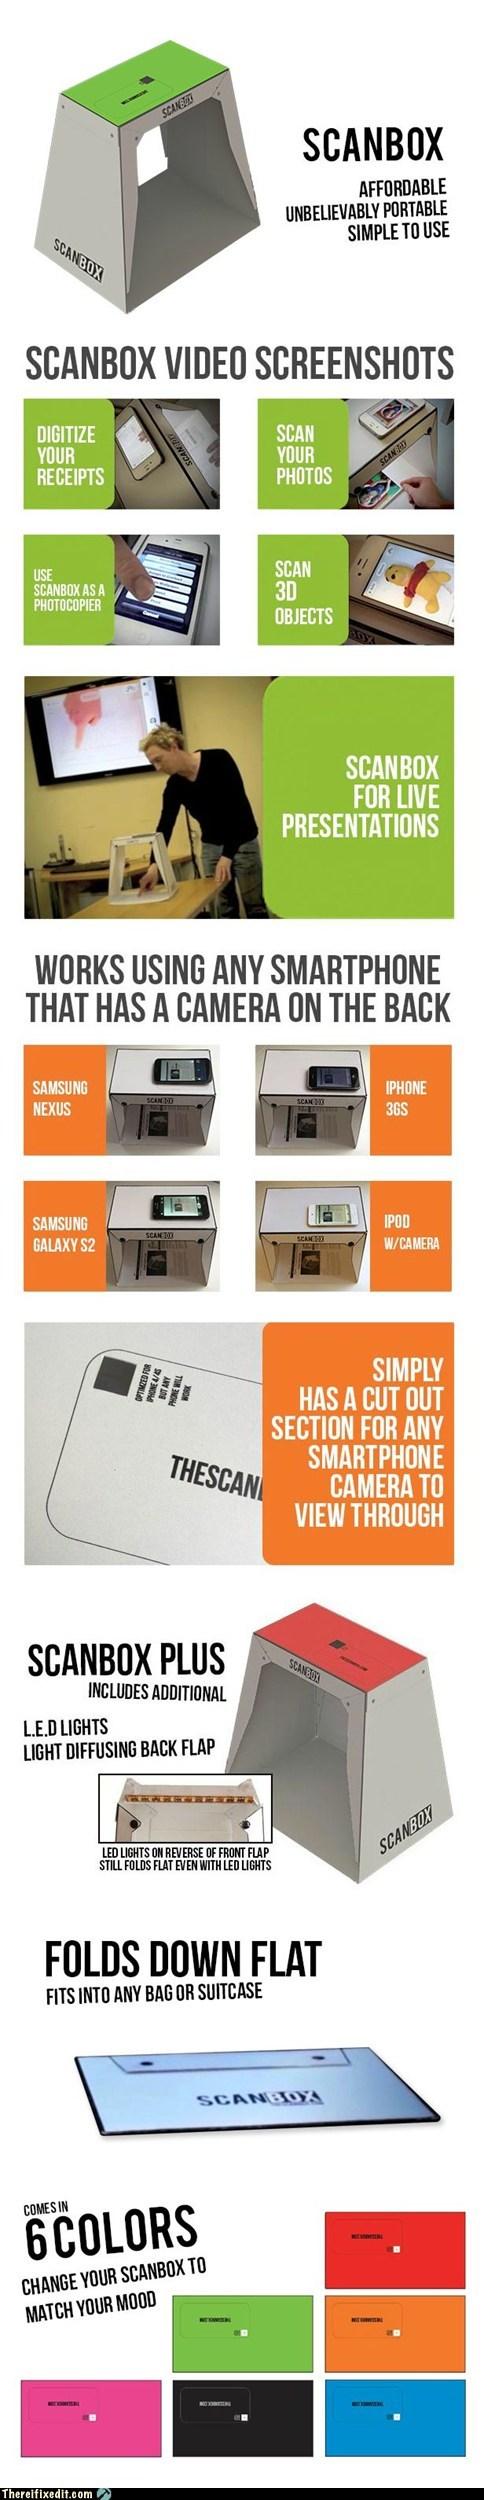 ben hillier iphone kickstarter luke allen phil bosua portable scanner scanbox scanner - 6308410624